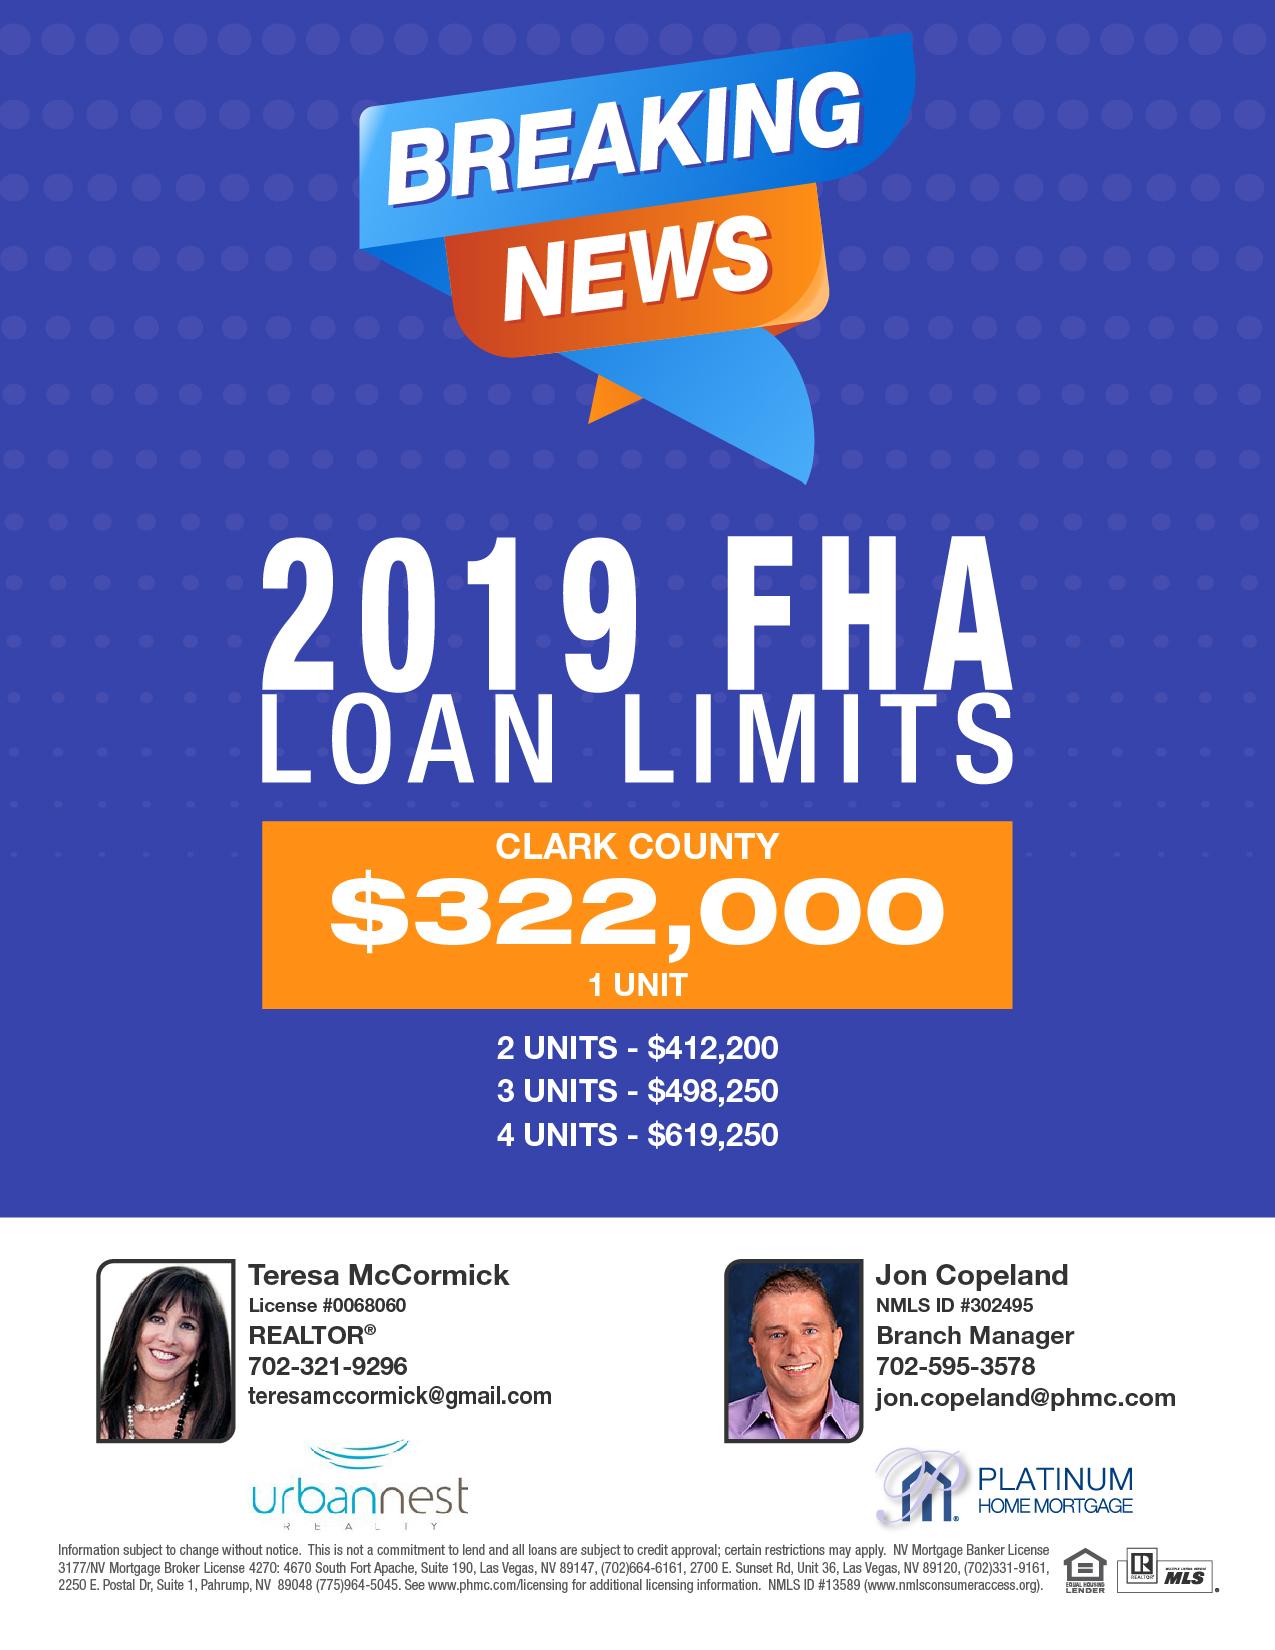 2019 Loan Limits - FHA Clark County_JCopeland-TMcCormick 121718-01.jpg